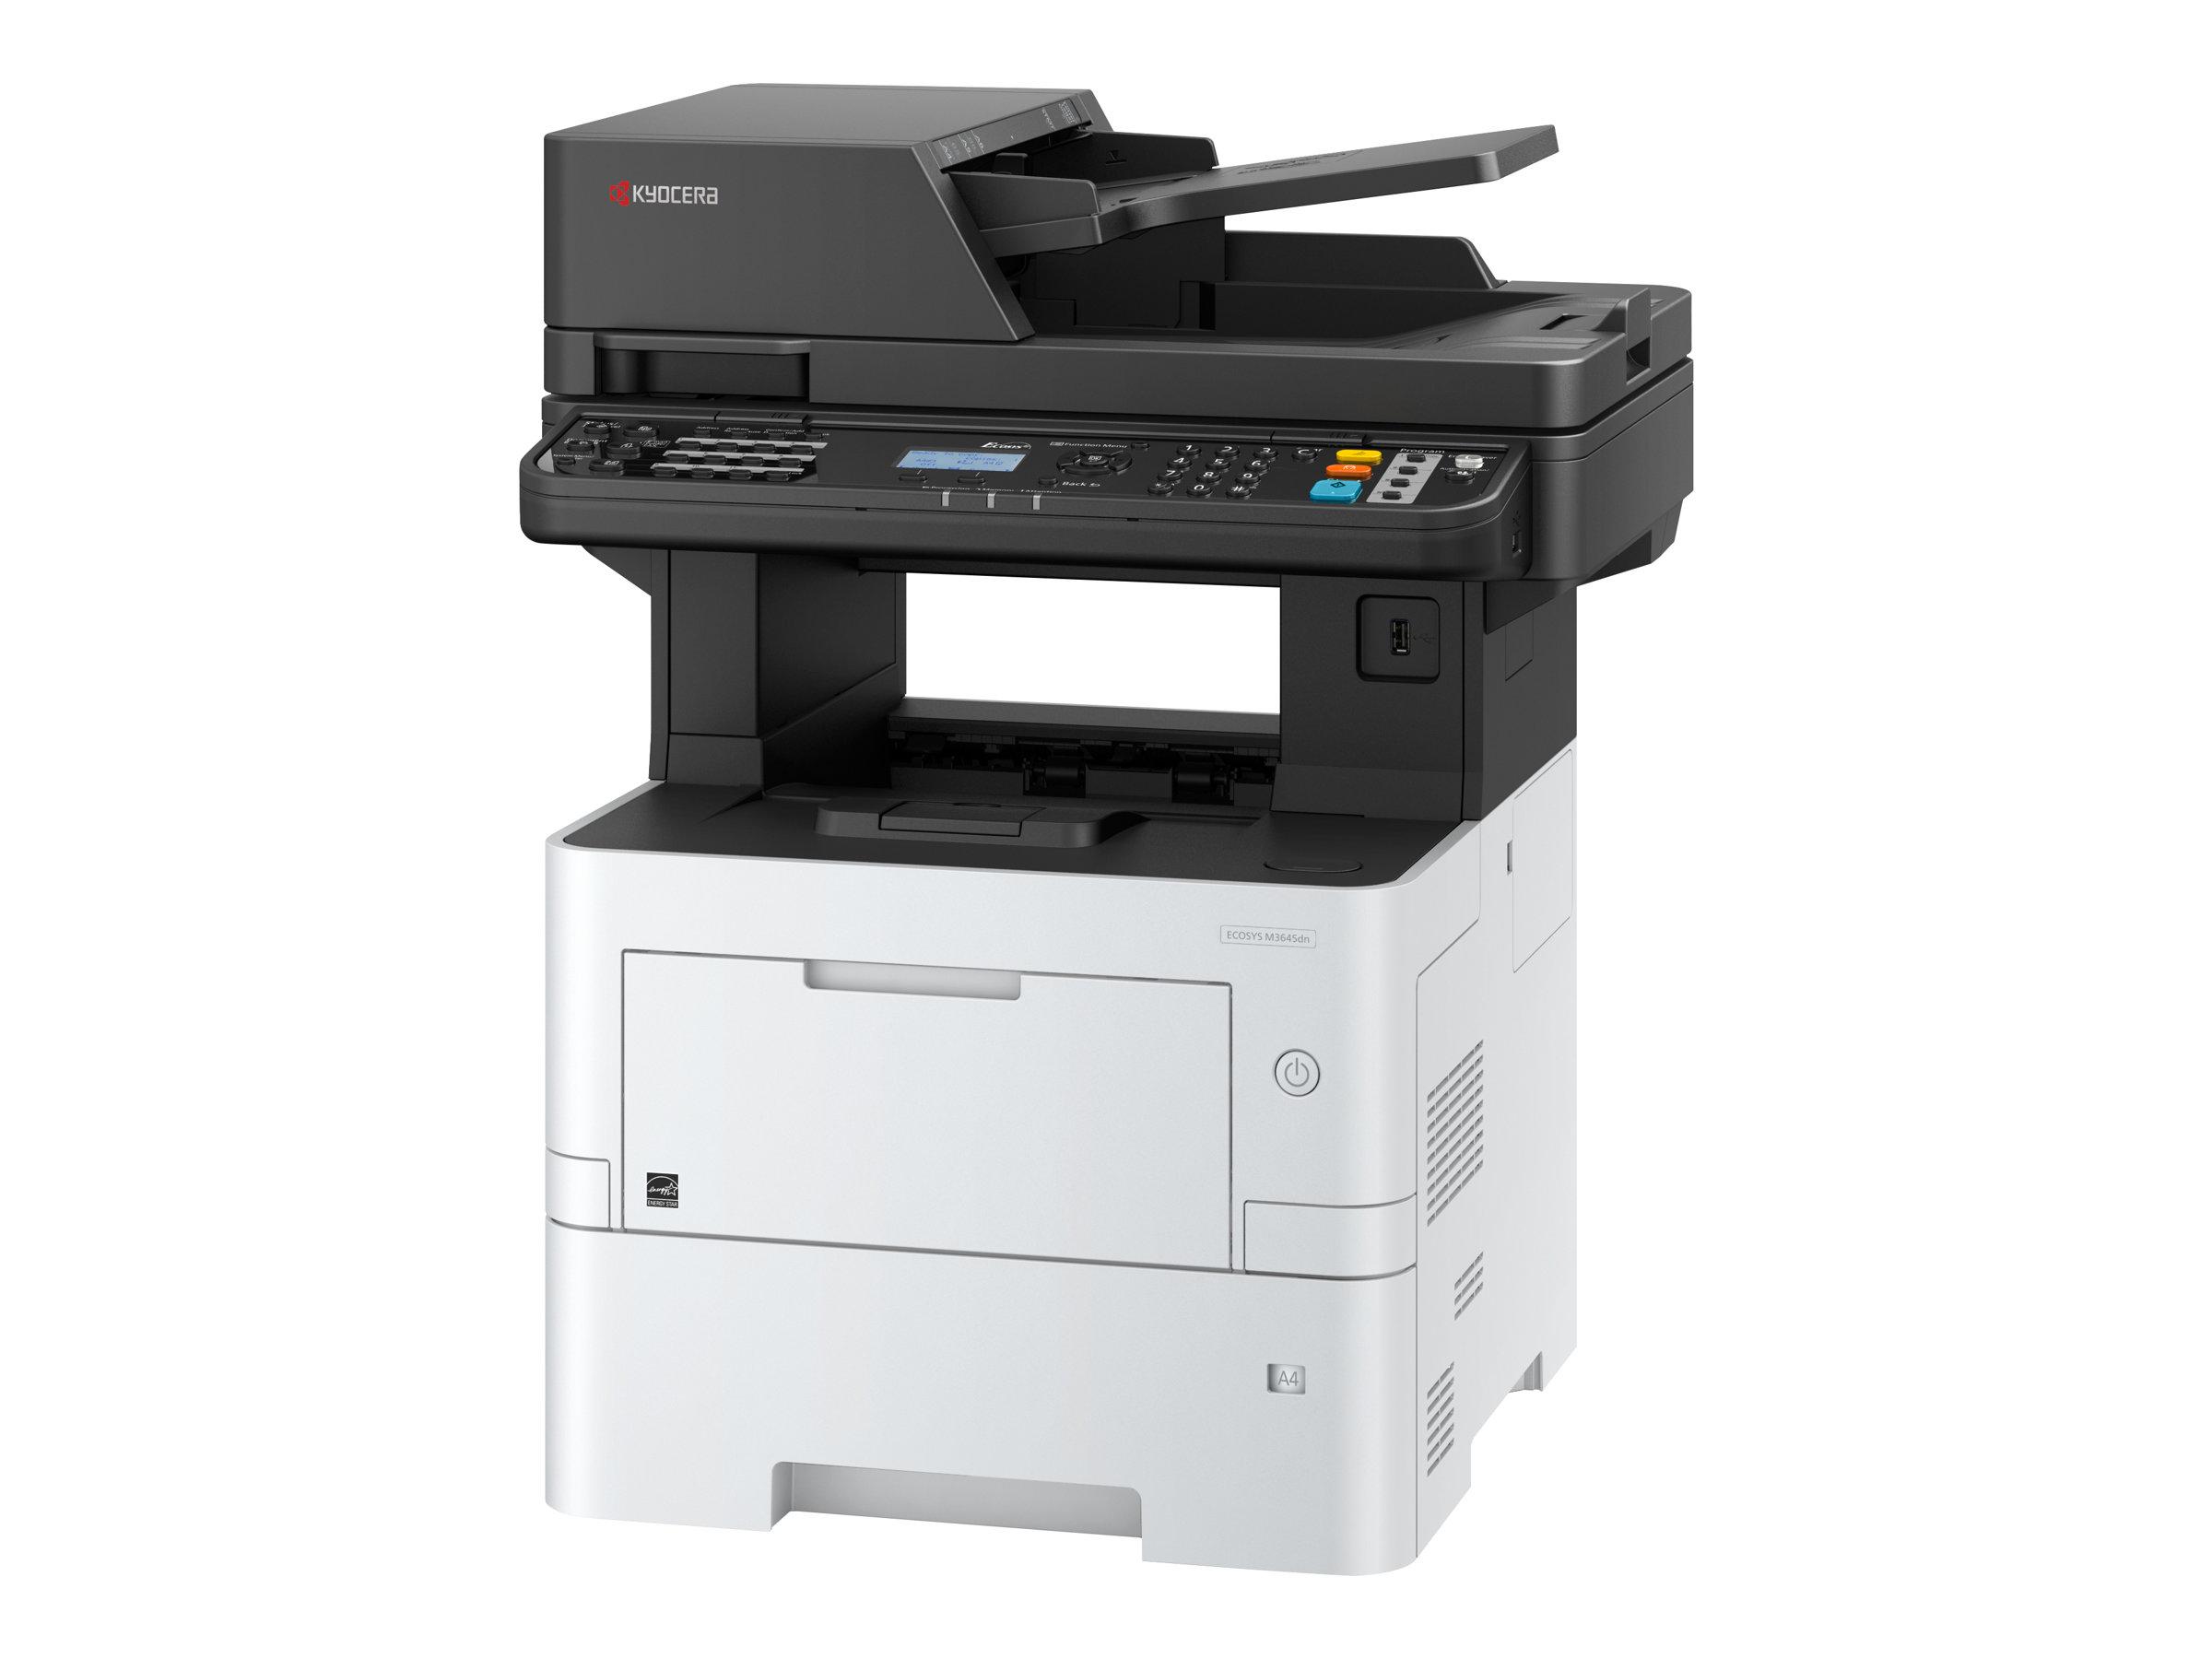 Kyocera ECOSYS M3645dn - Multifunktionsdrucker - s/w - Laser - A4 (210 x 297 mm)